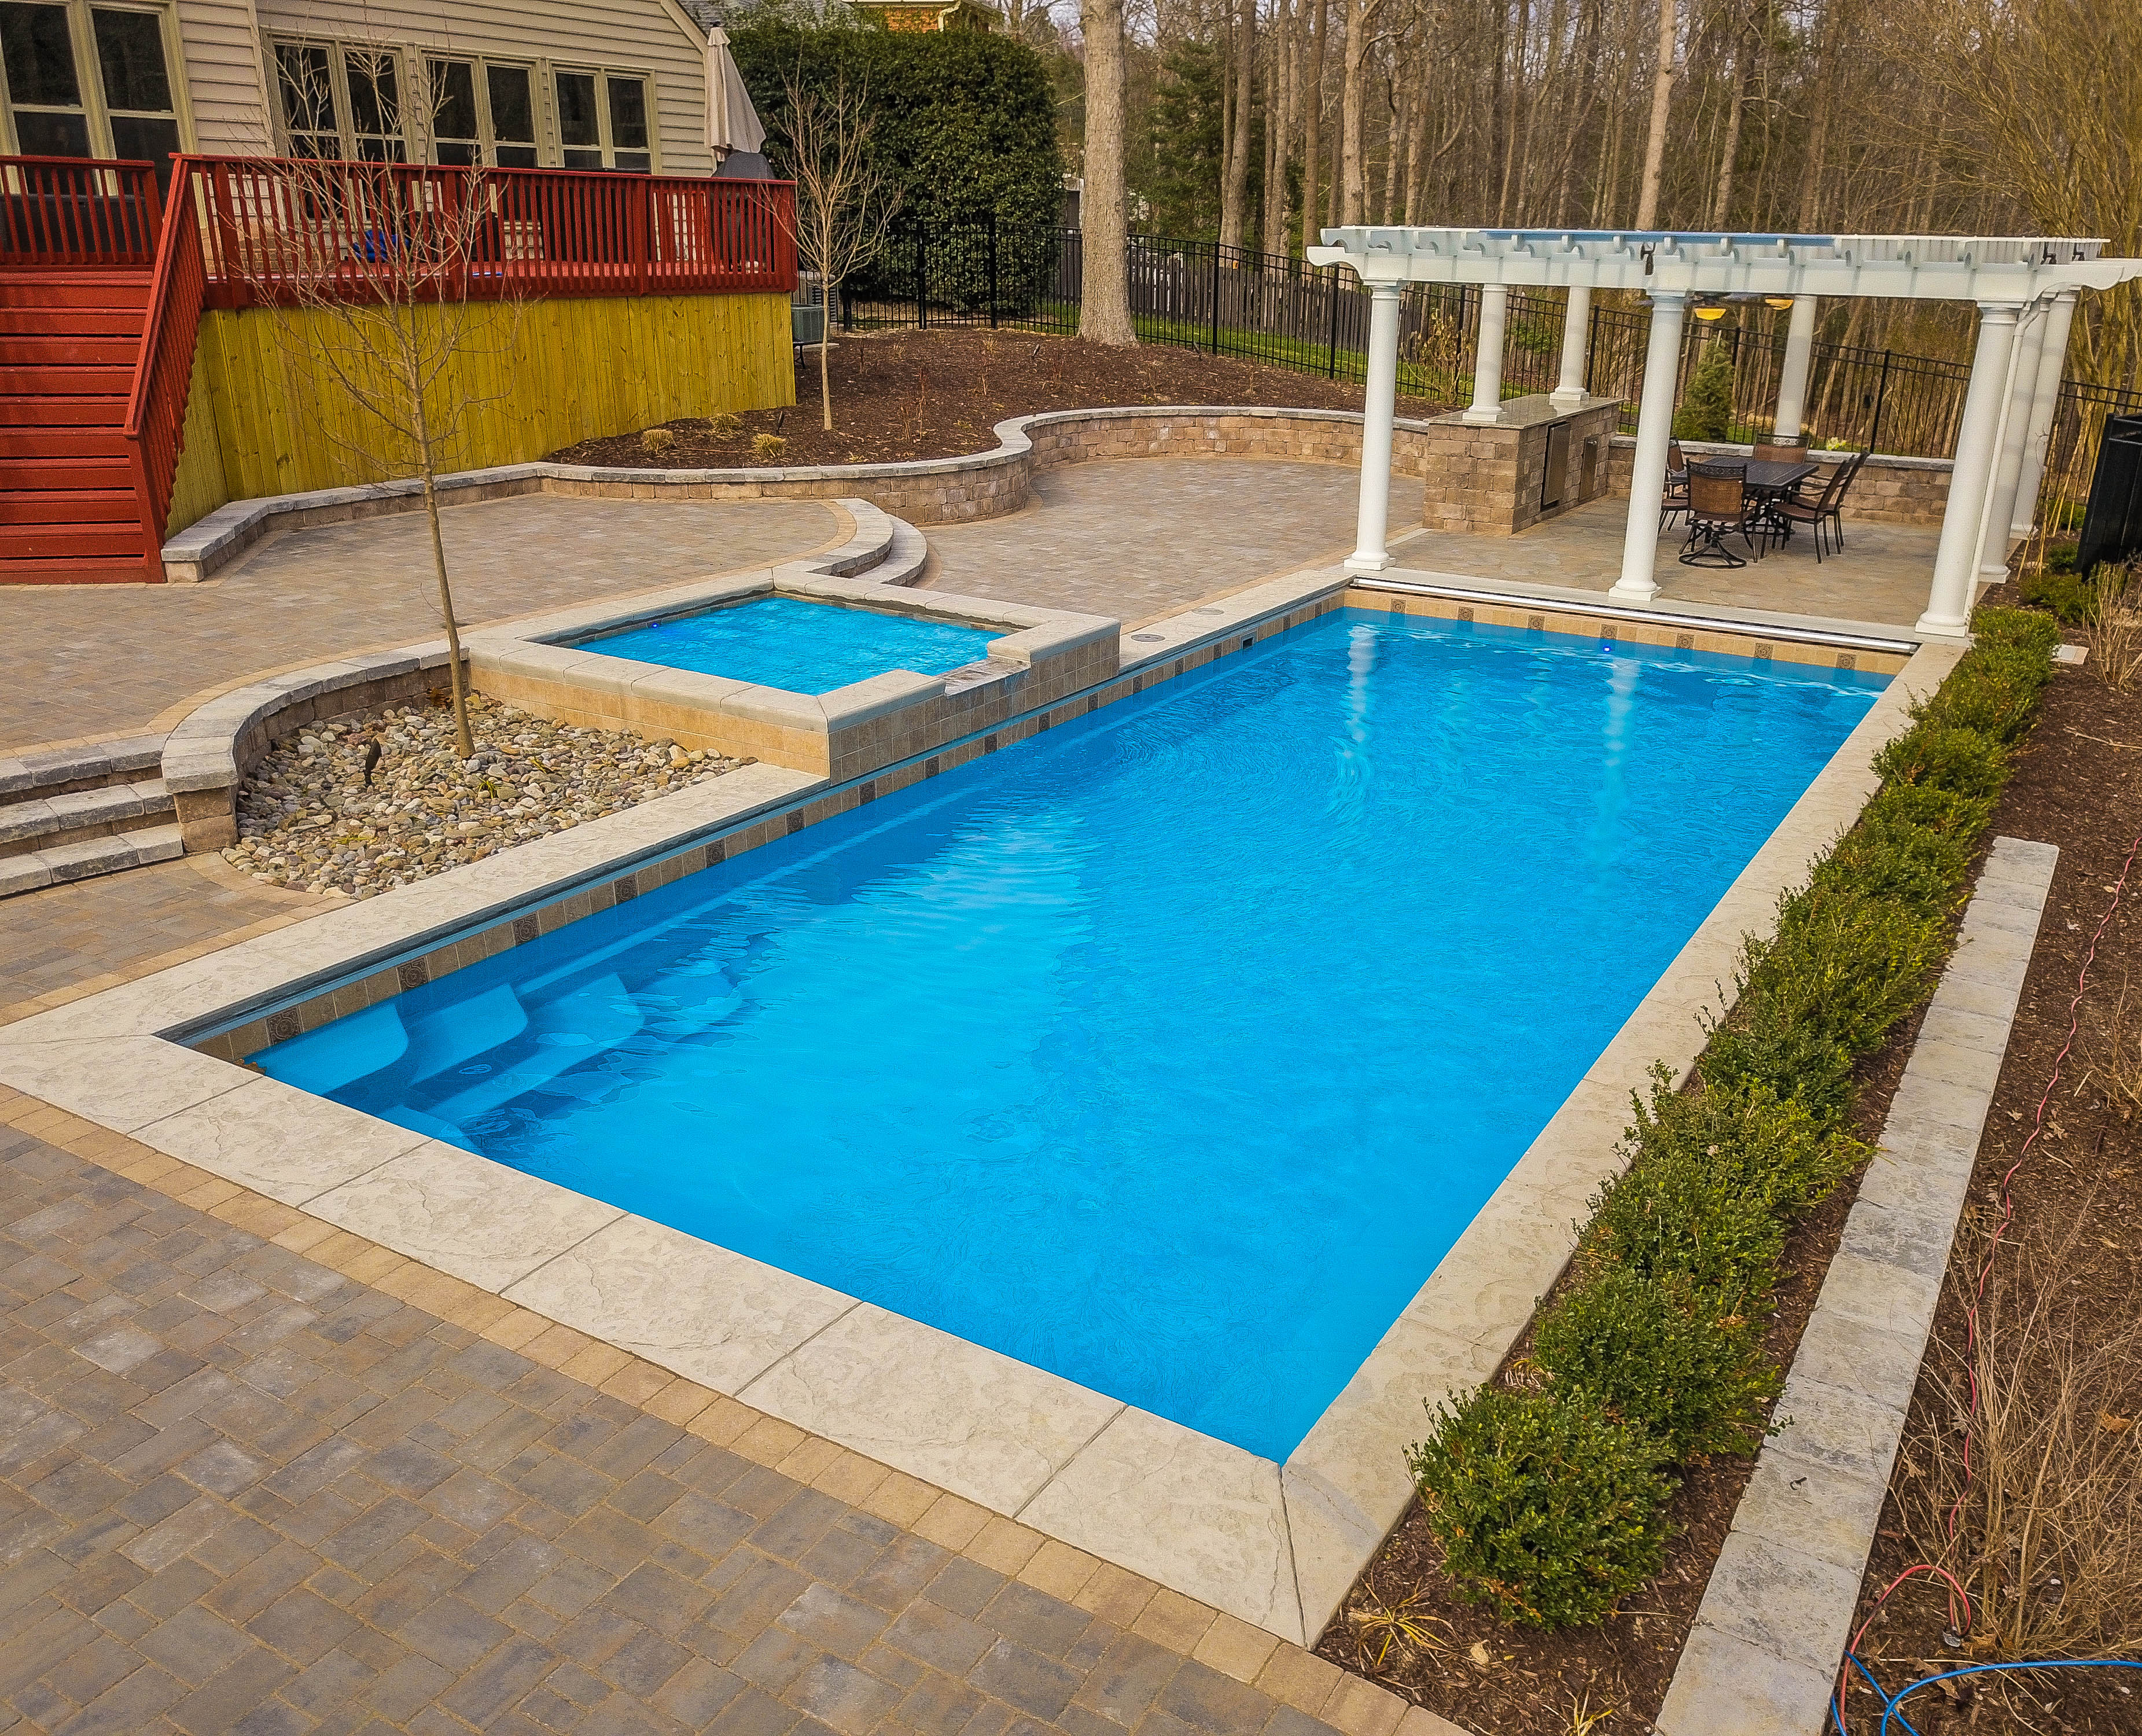 Rectangular Fiberglass Pool (G36) With Pergold And Elevated Tanning Ledge